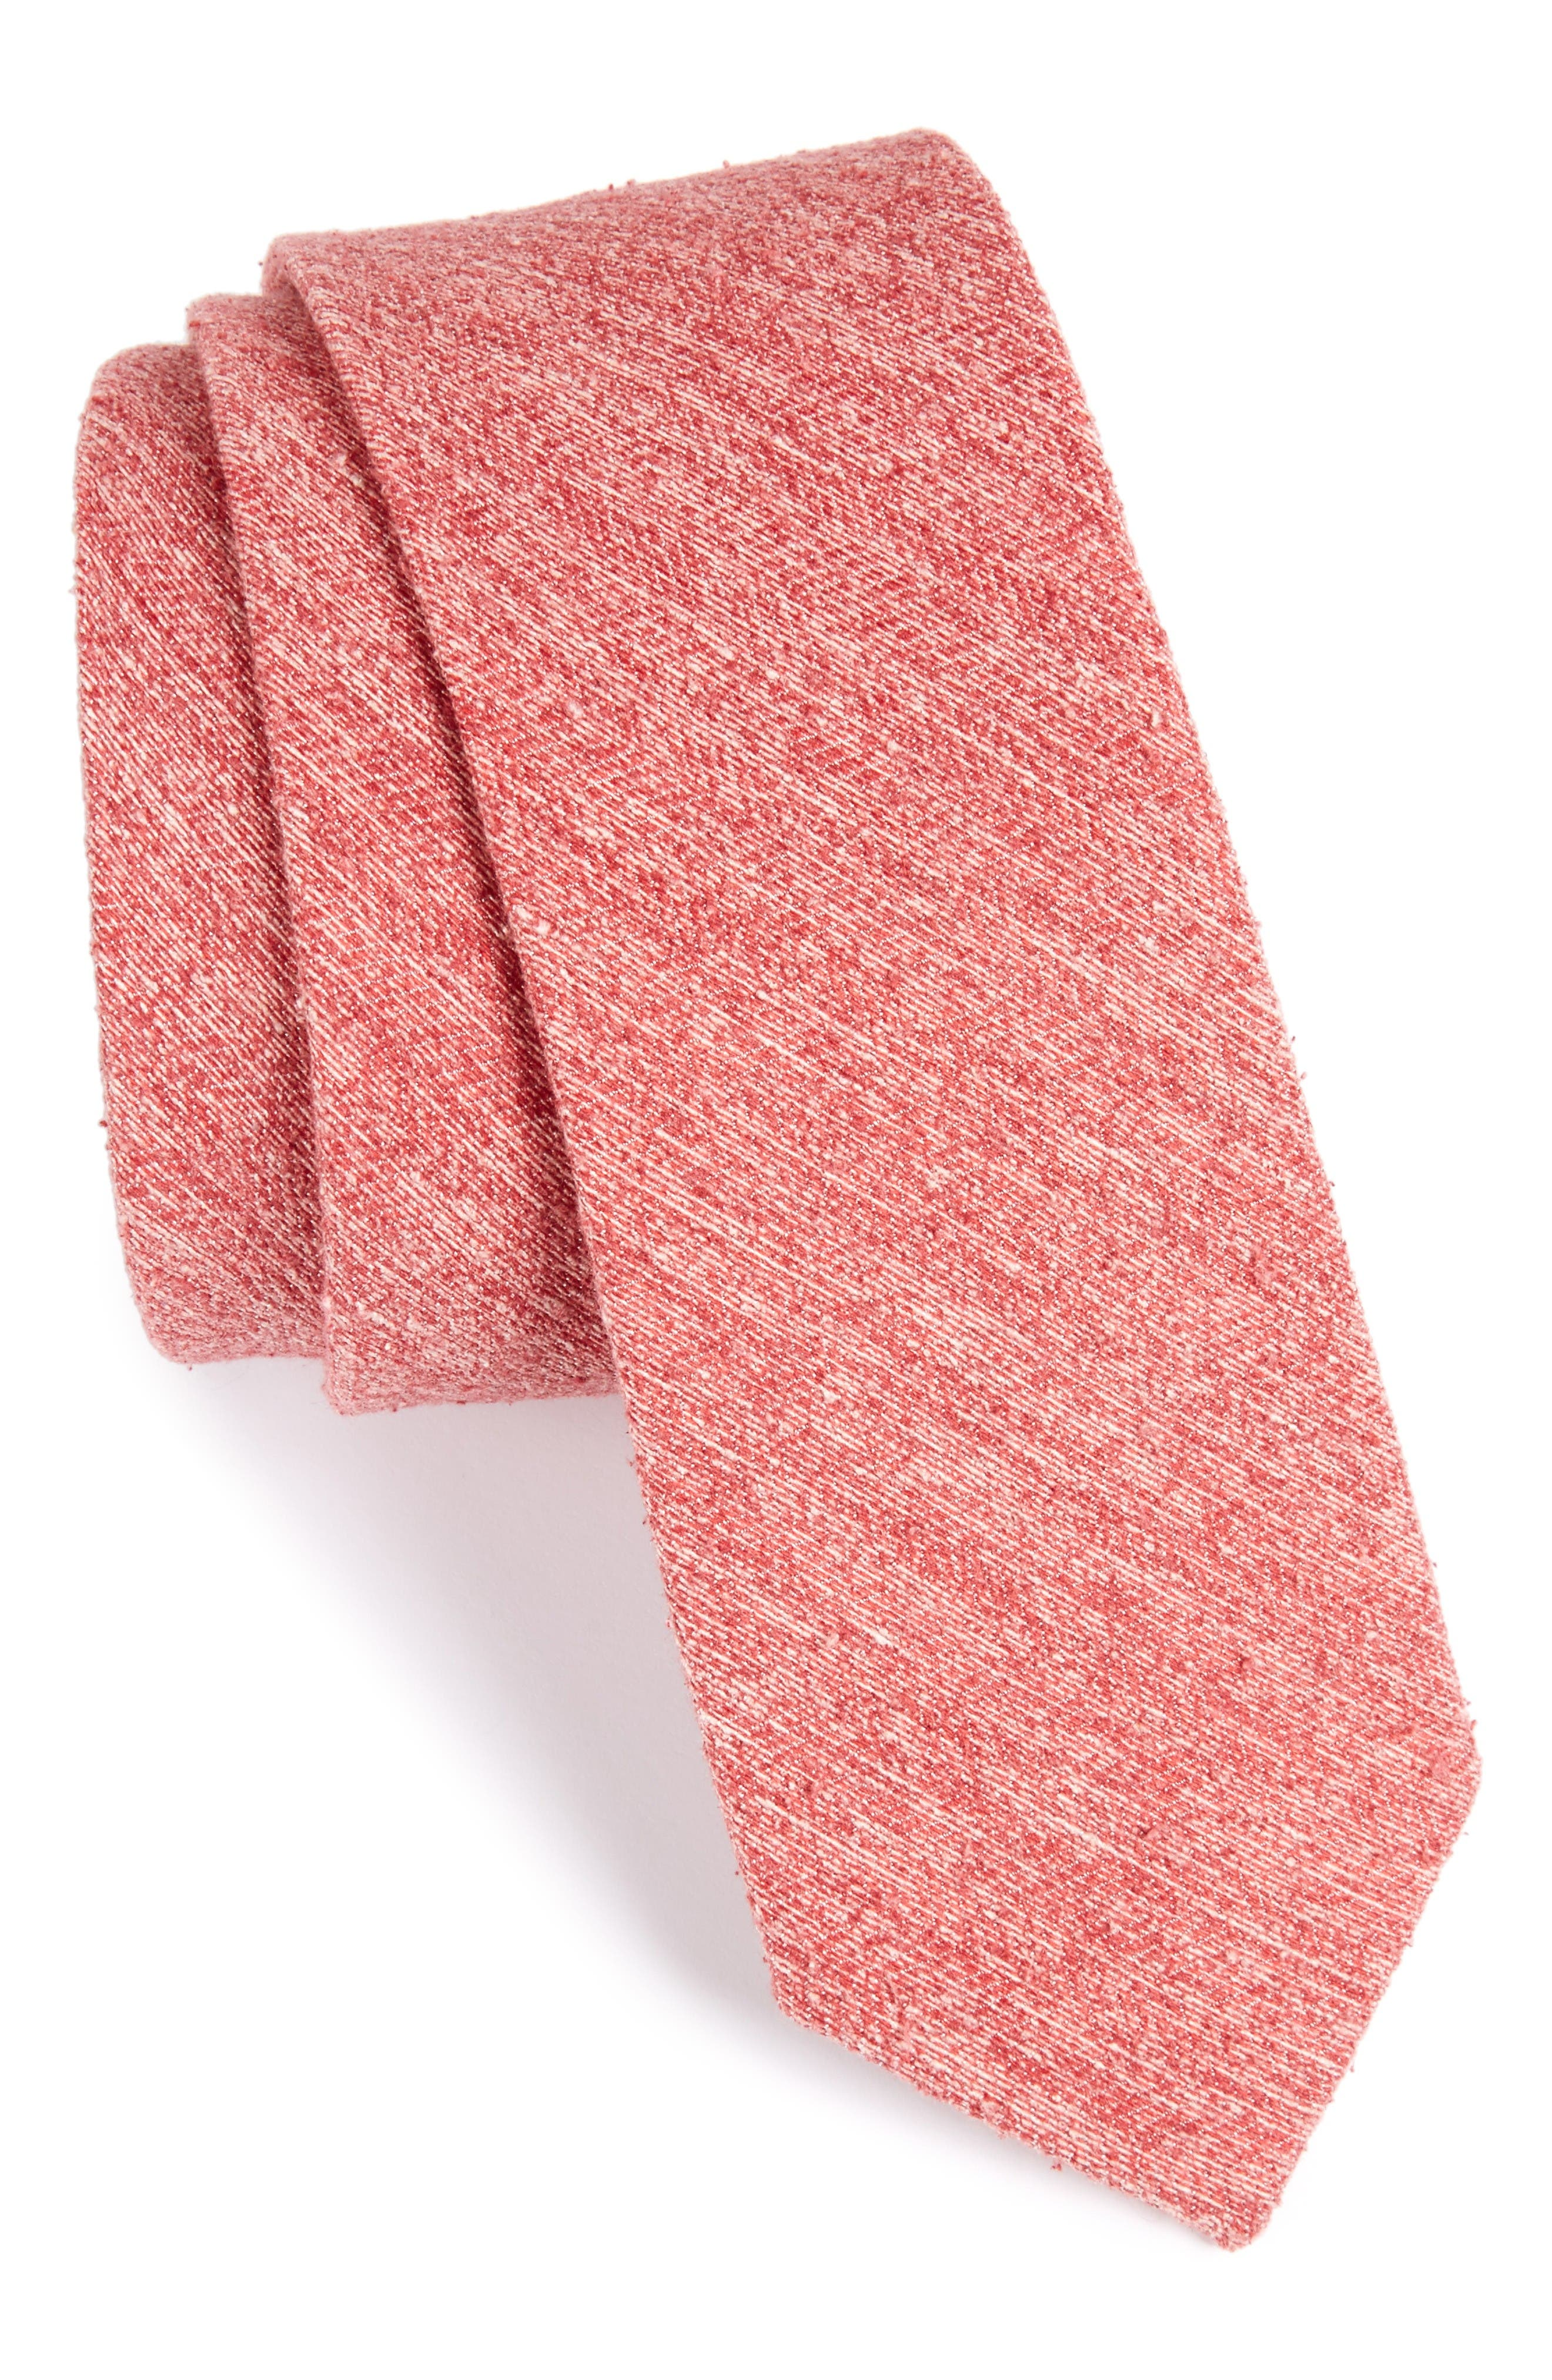 Main Image - The Tie Bar Buff Solid Silk Skinny Tie